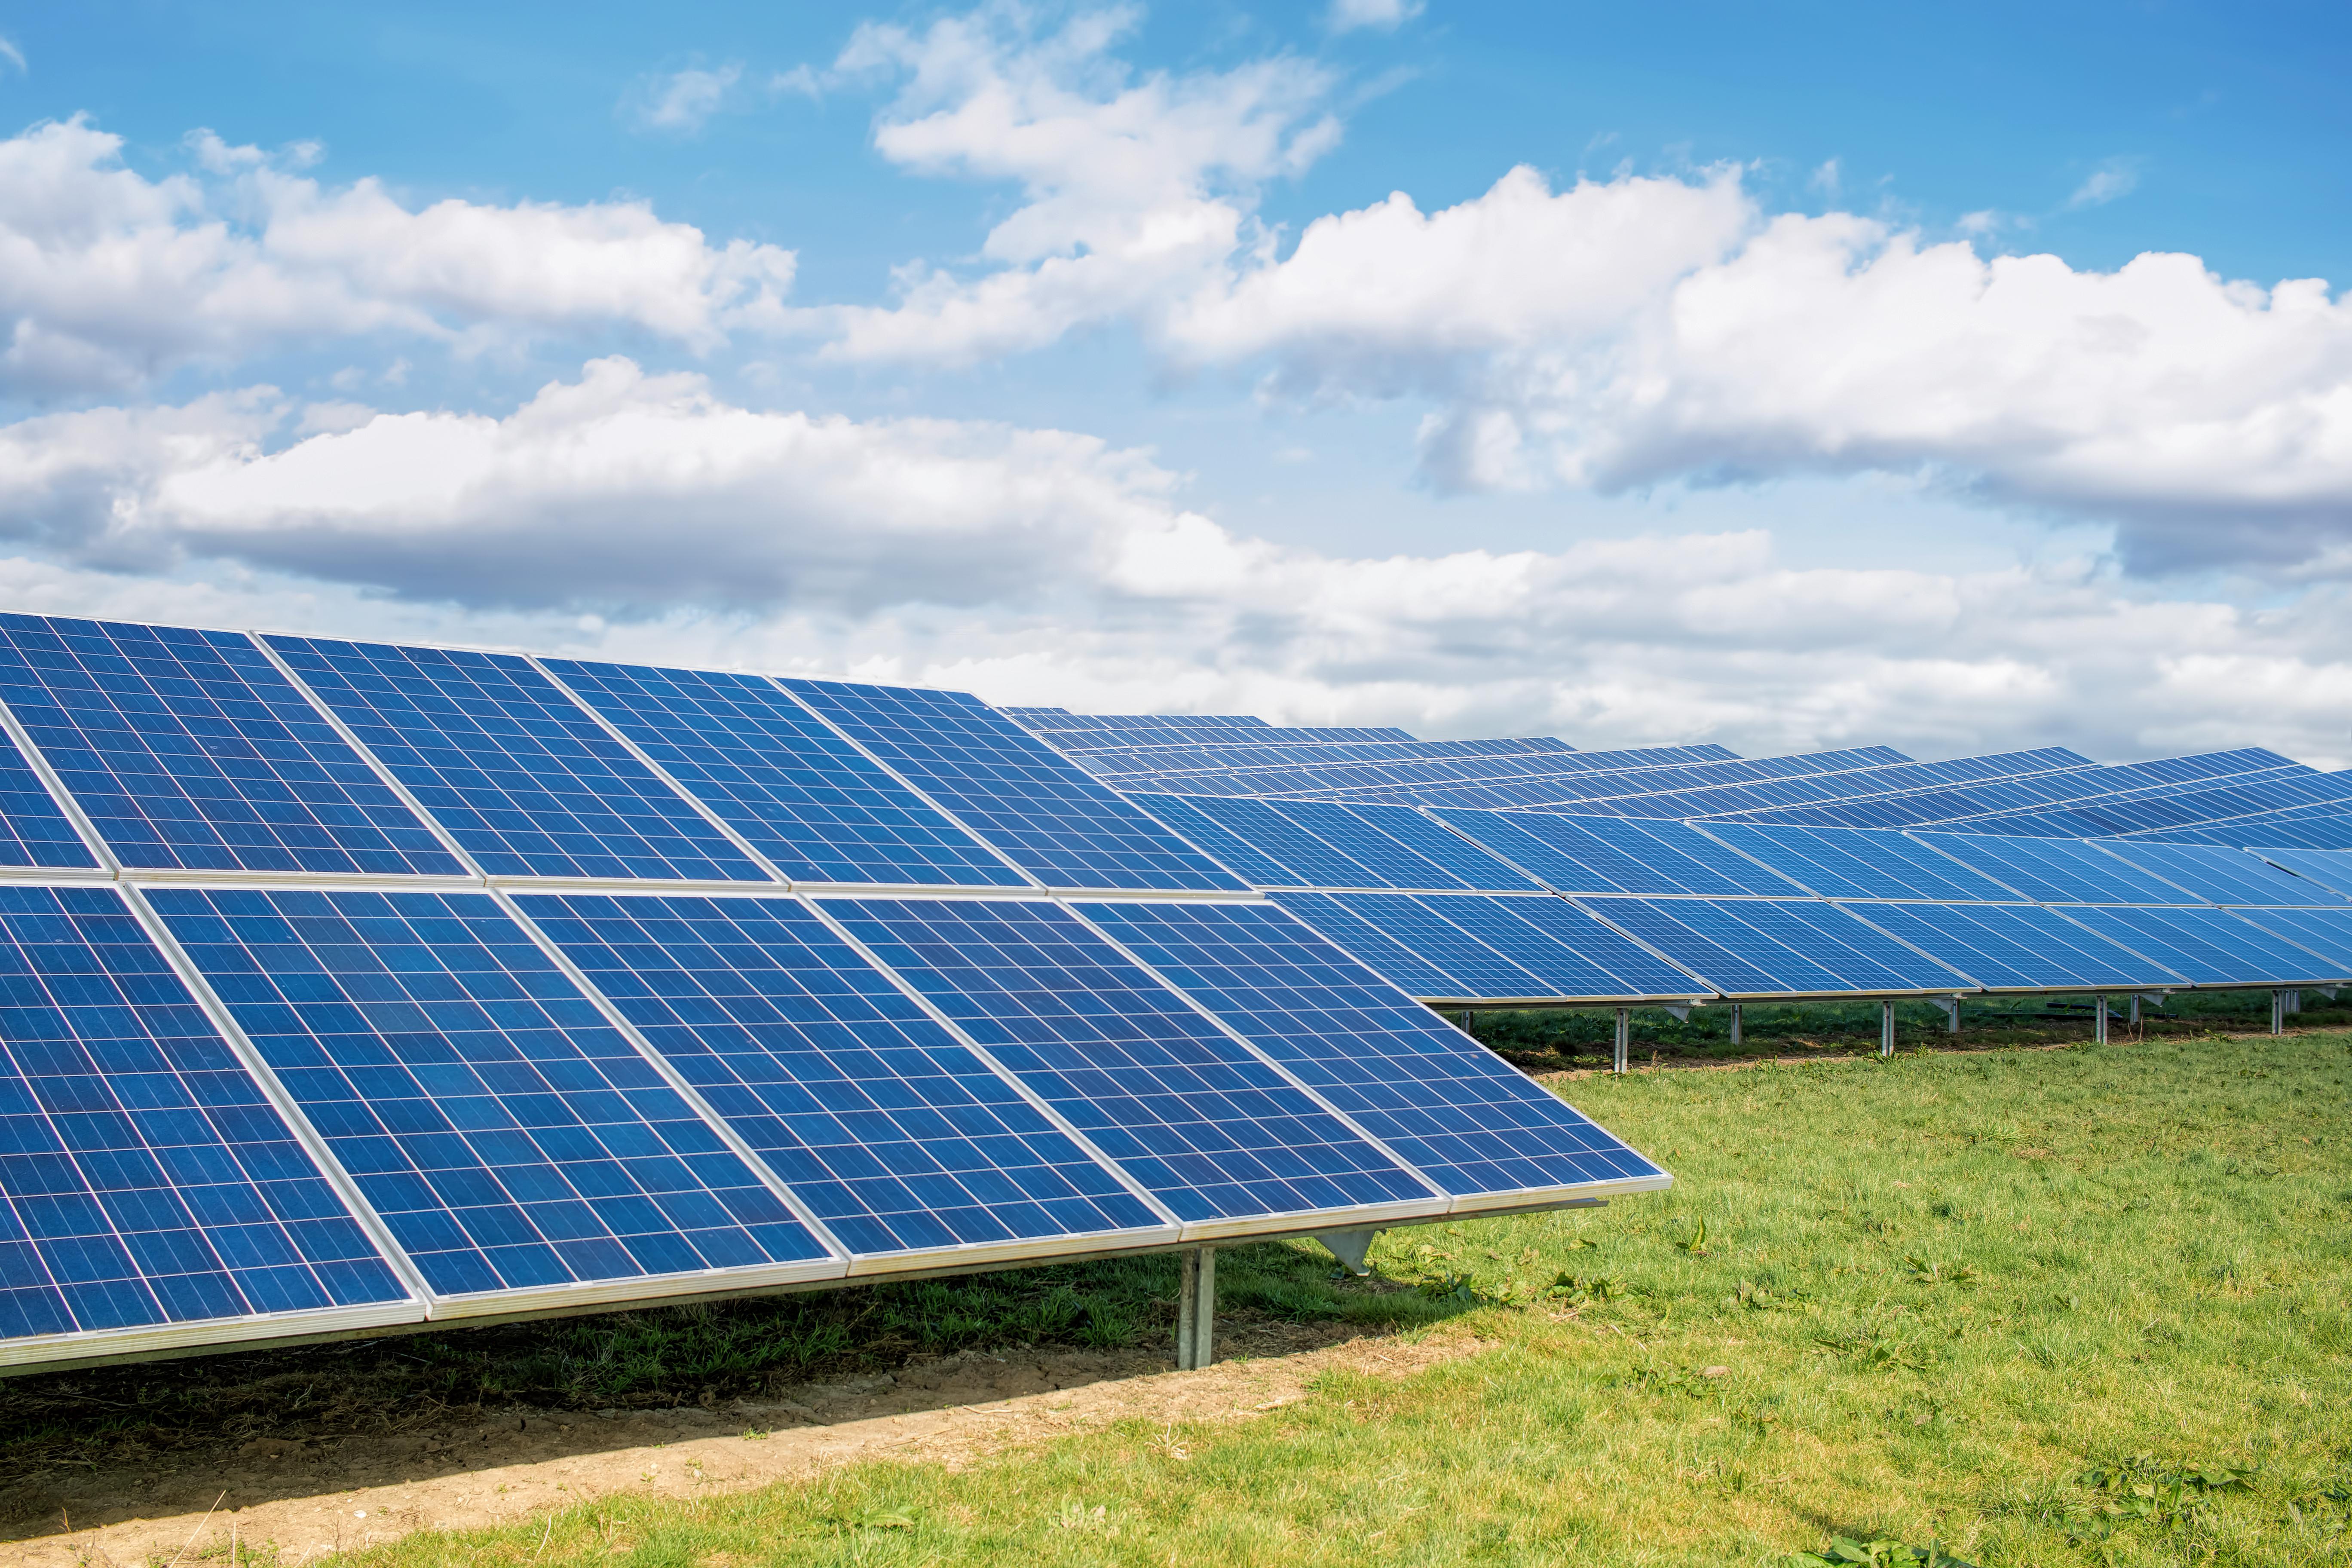 Solar array in a grassy field.